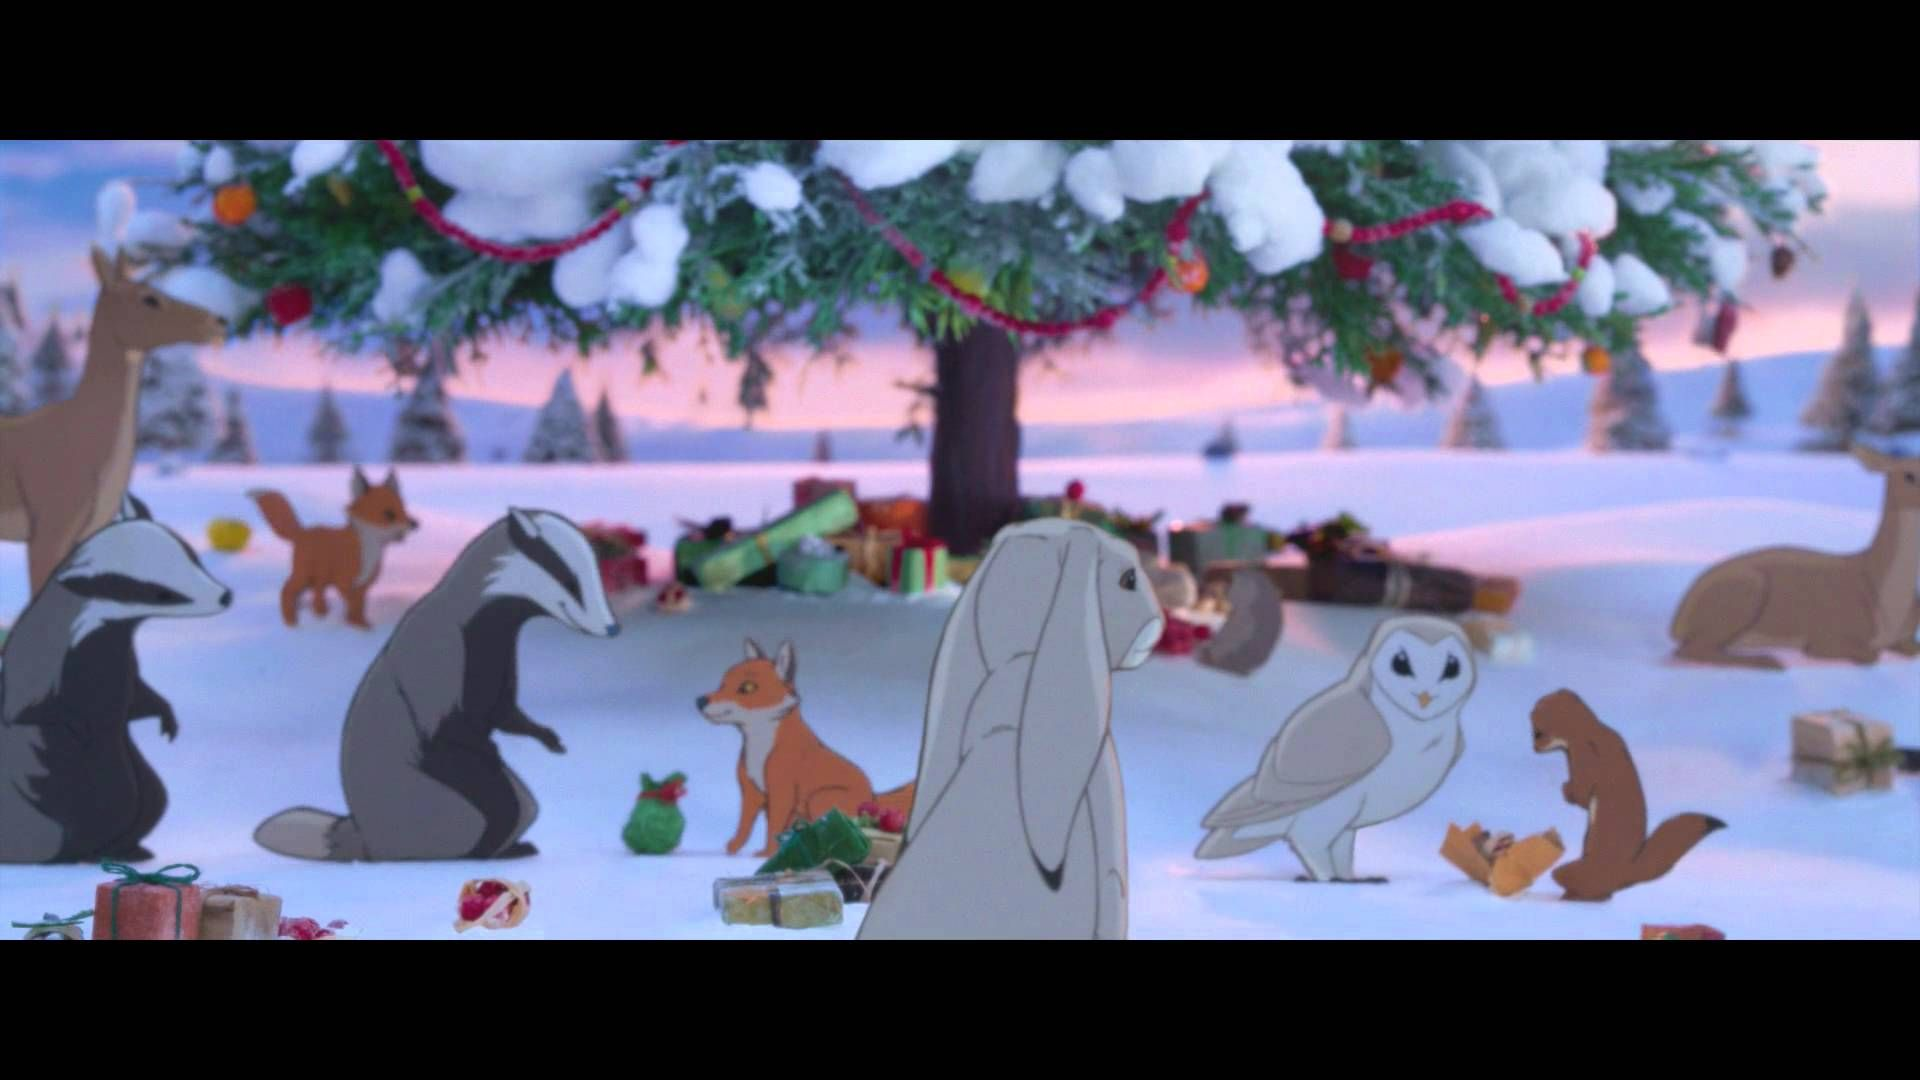 [ John Lewis Christmas Advert 2013 - The Bear & The Hare ]